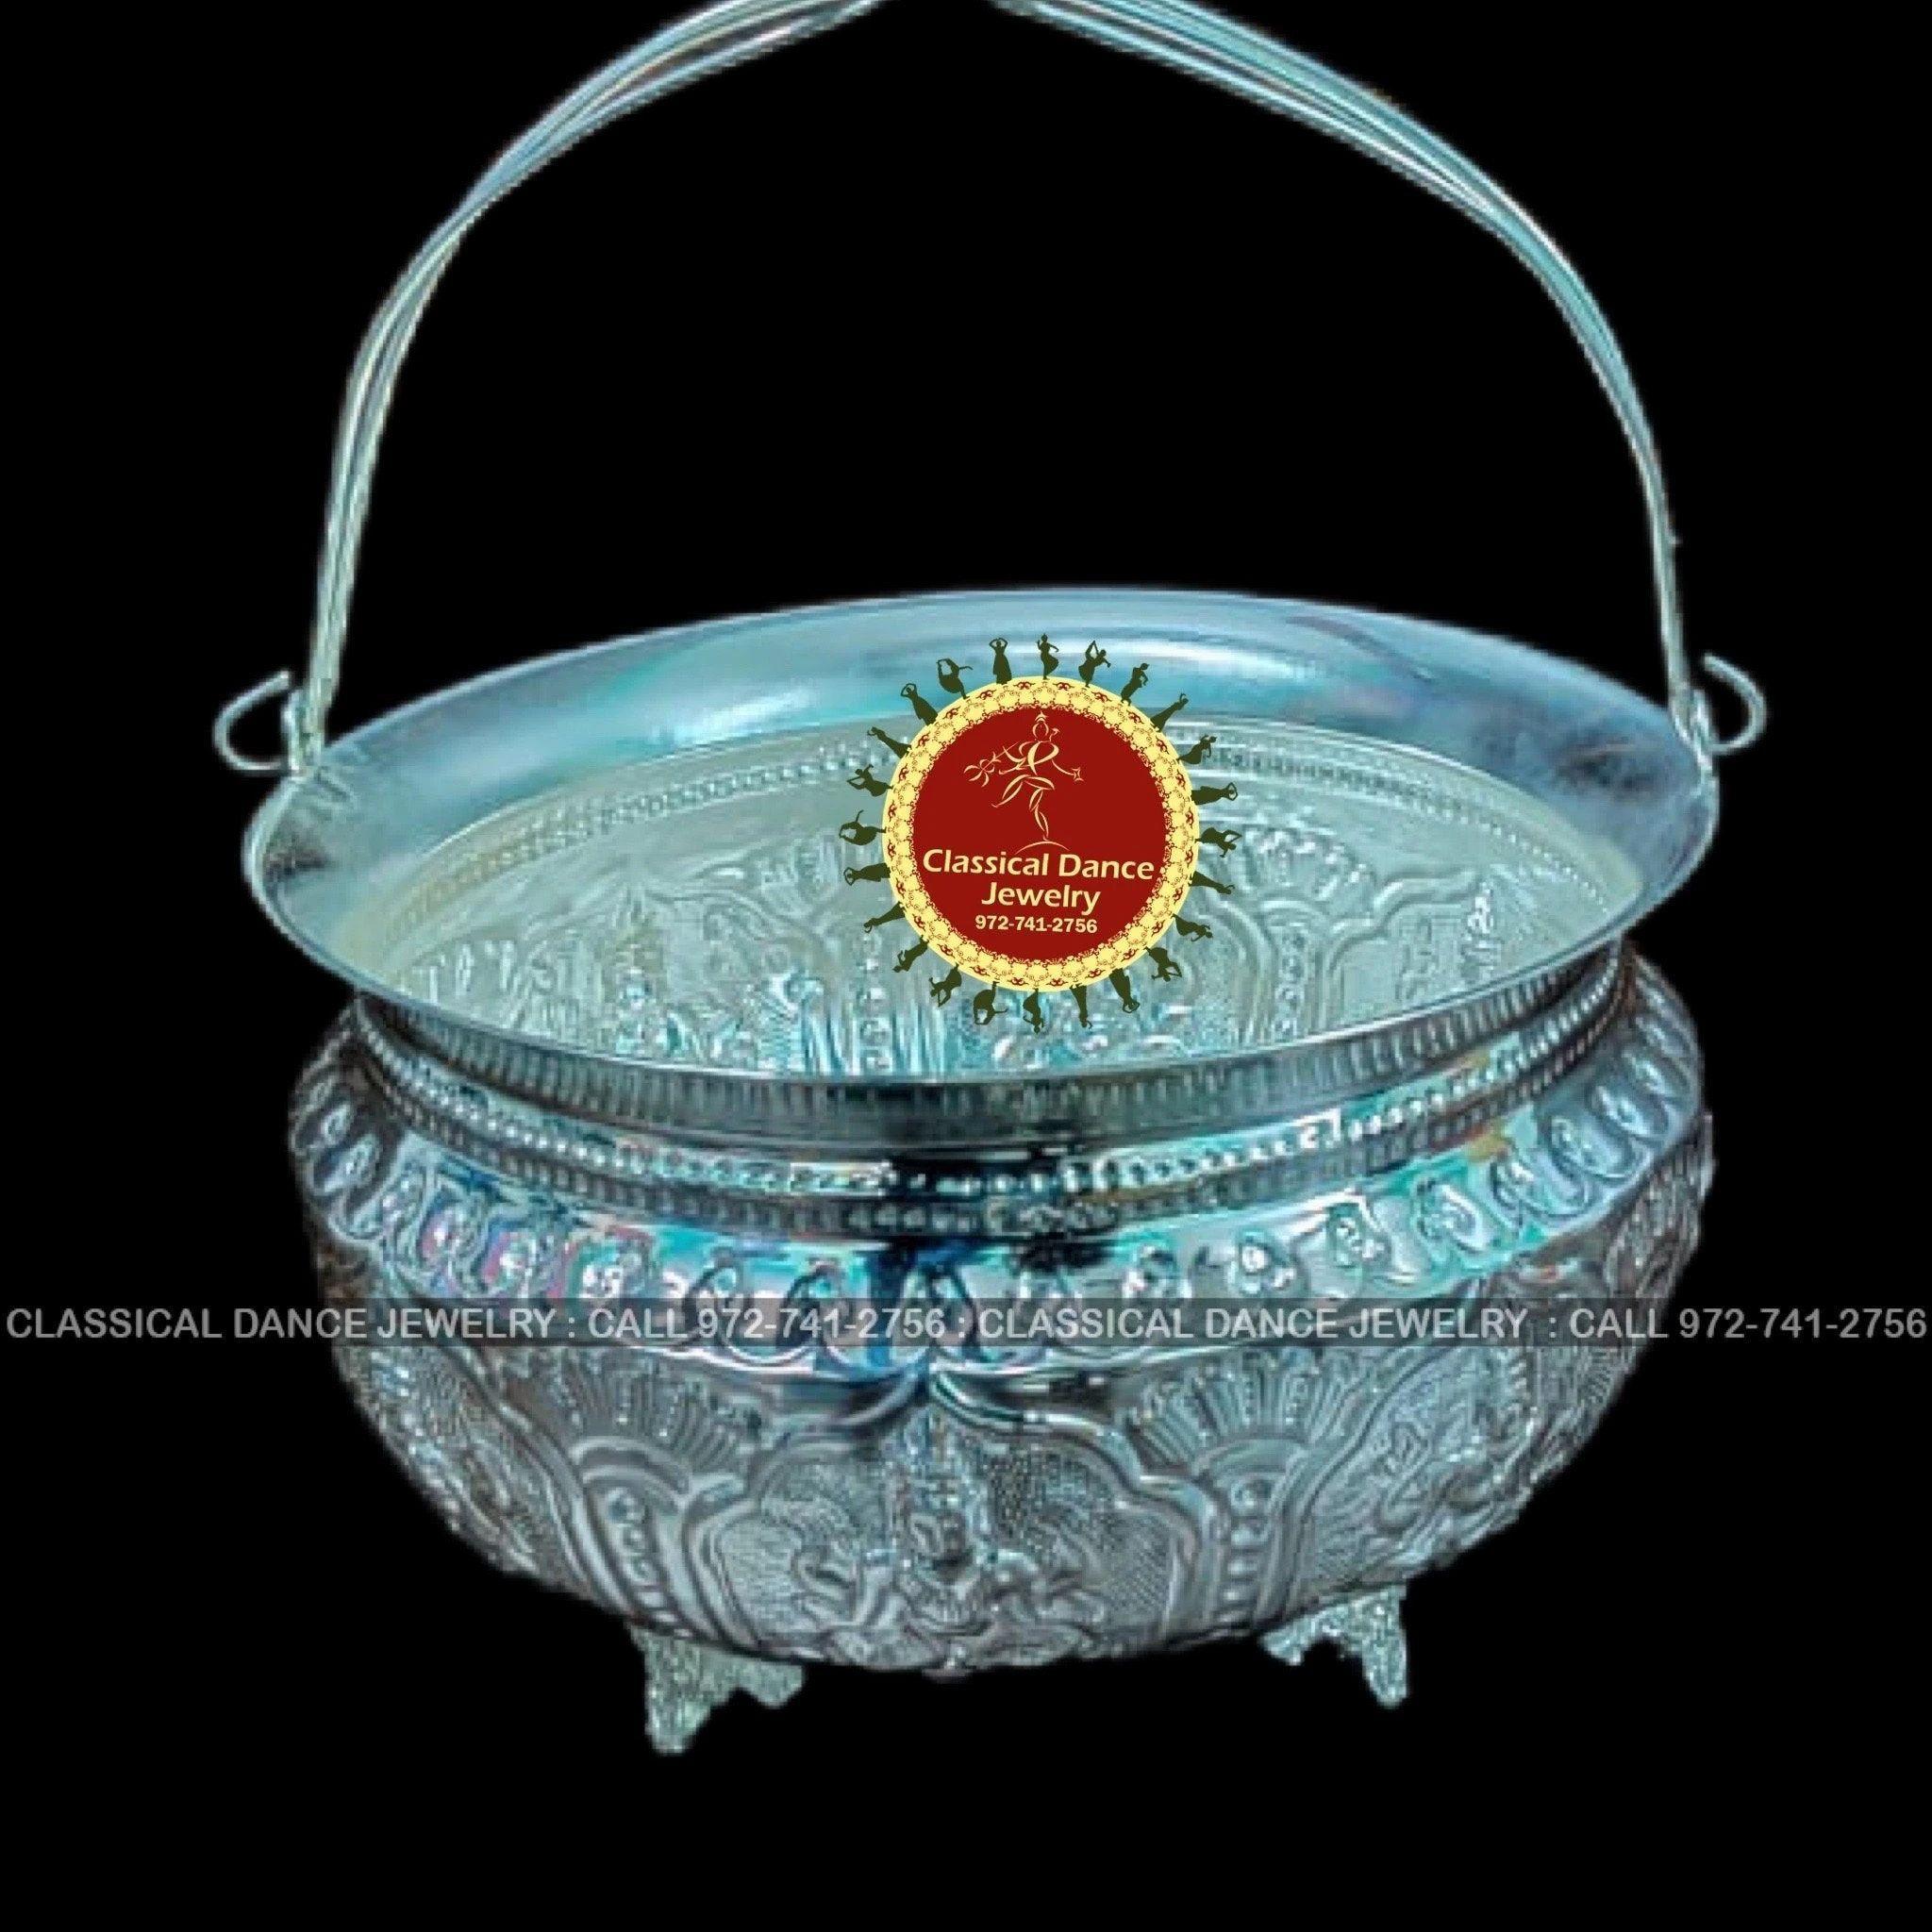 Engagement Wedding Pooja German Silver washable Designer PUJA BELL Diwali Classical Dance Jewelry Pongal Gantha